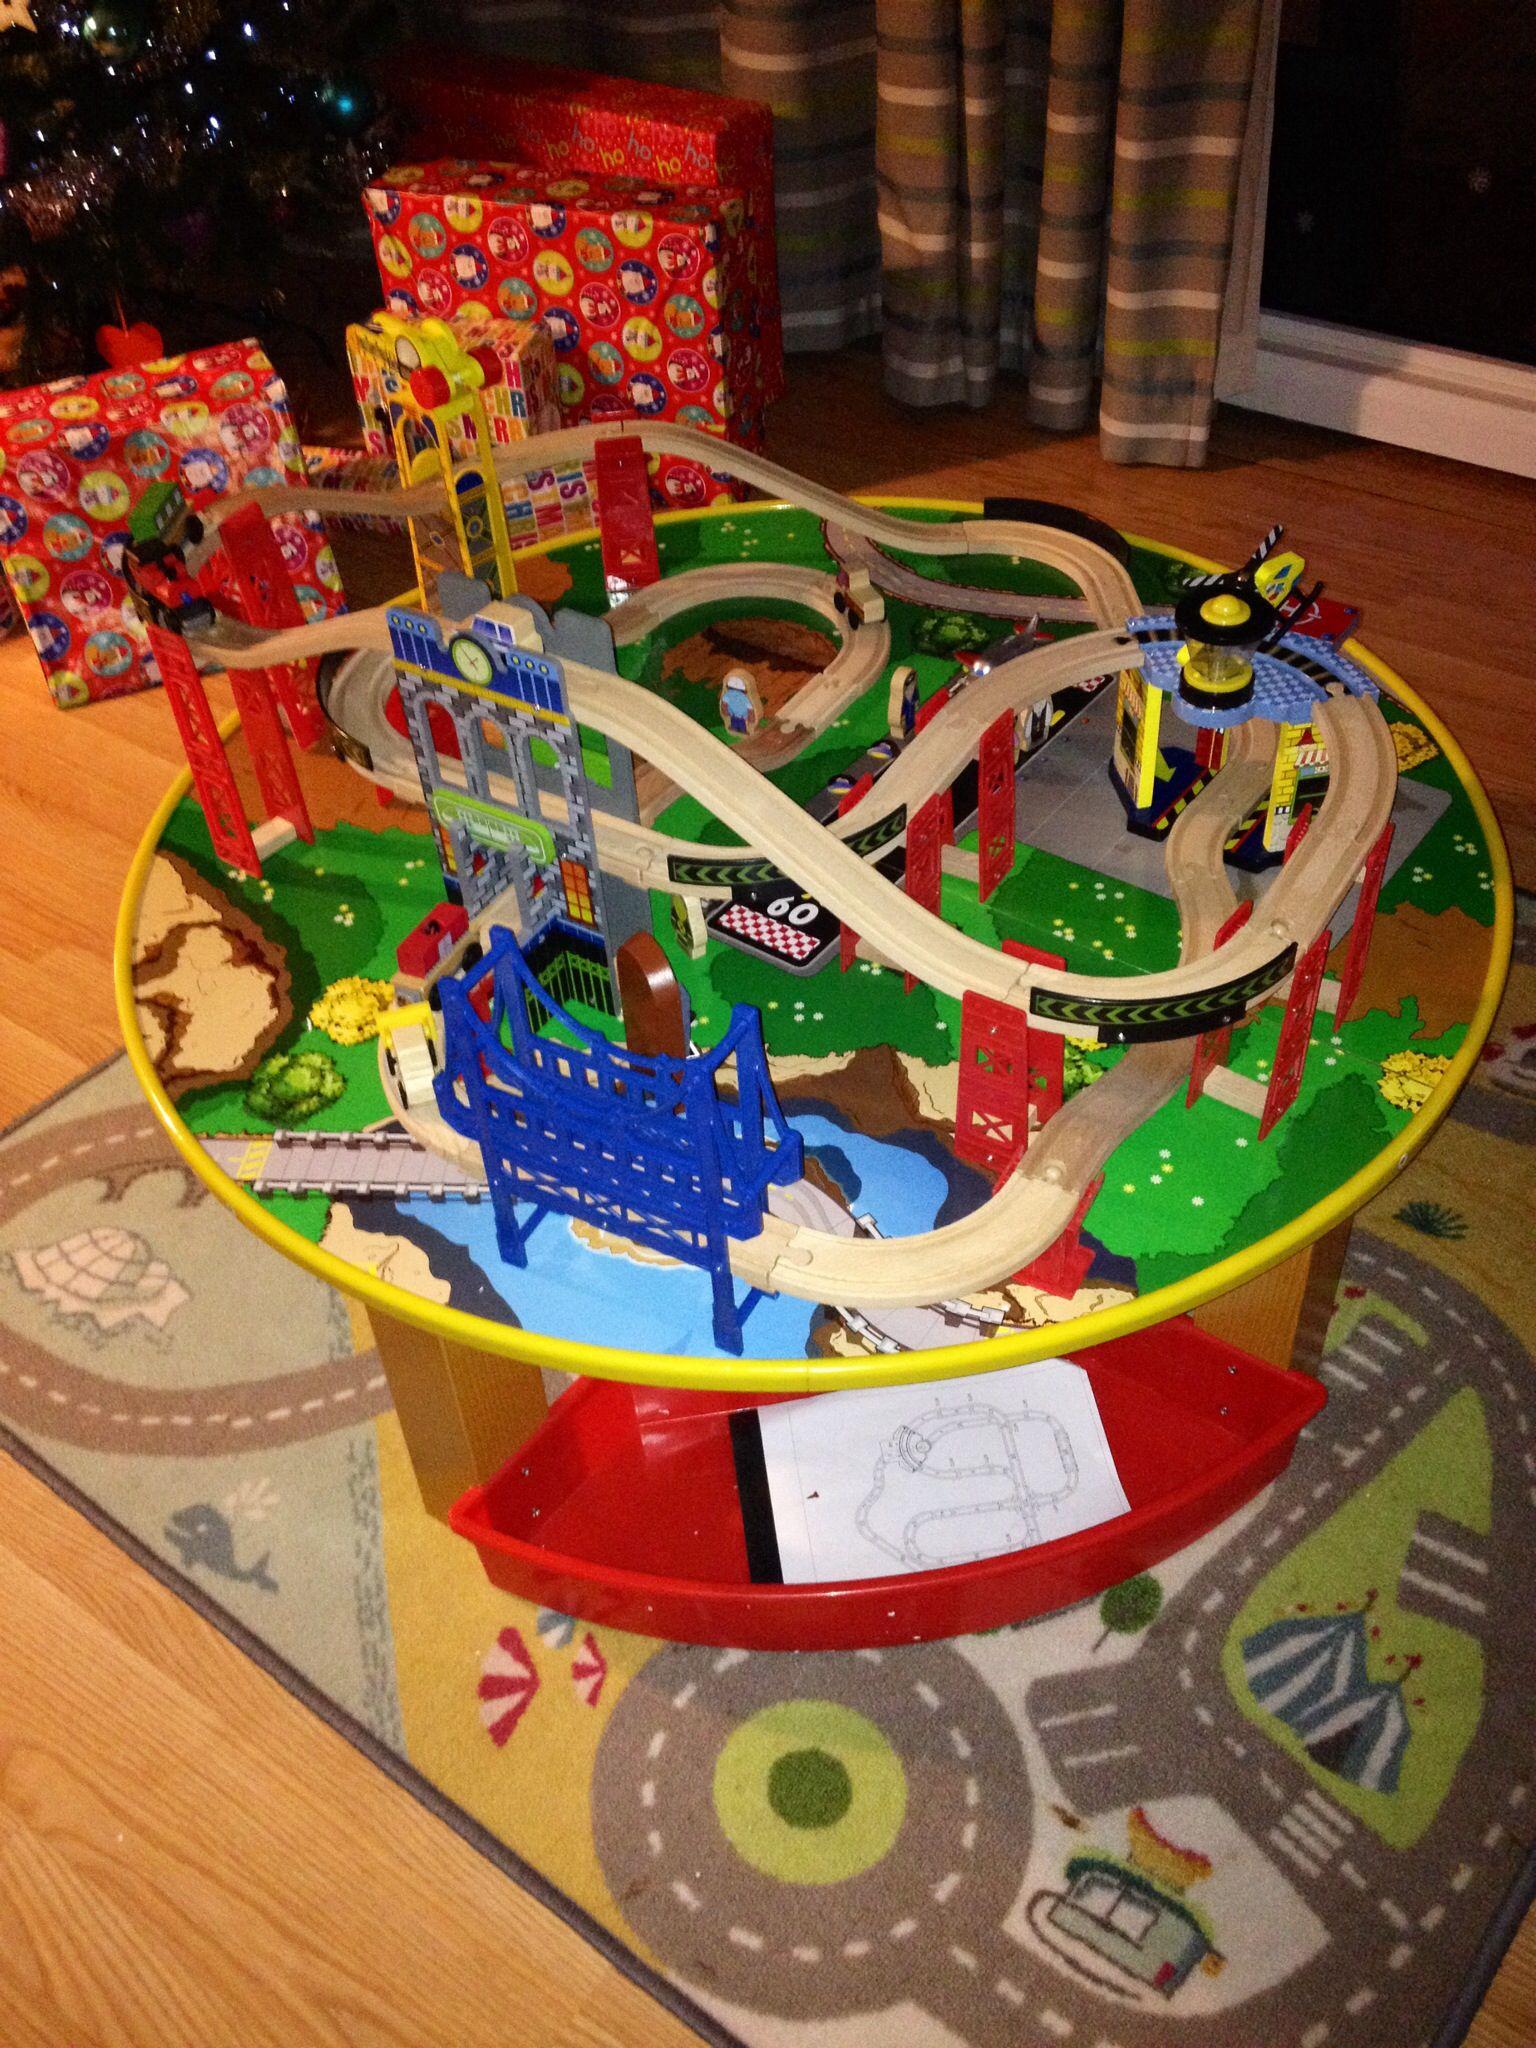 Kidkraft austin toy box natural 14953 - Kid Kraft Round Train Table